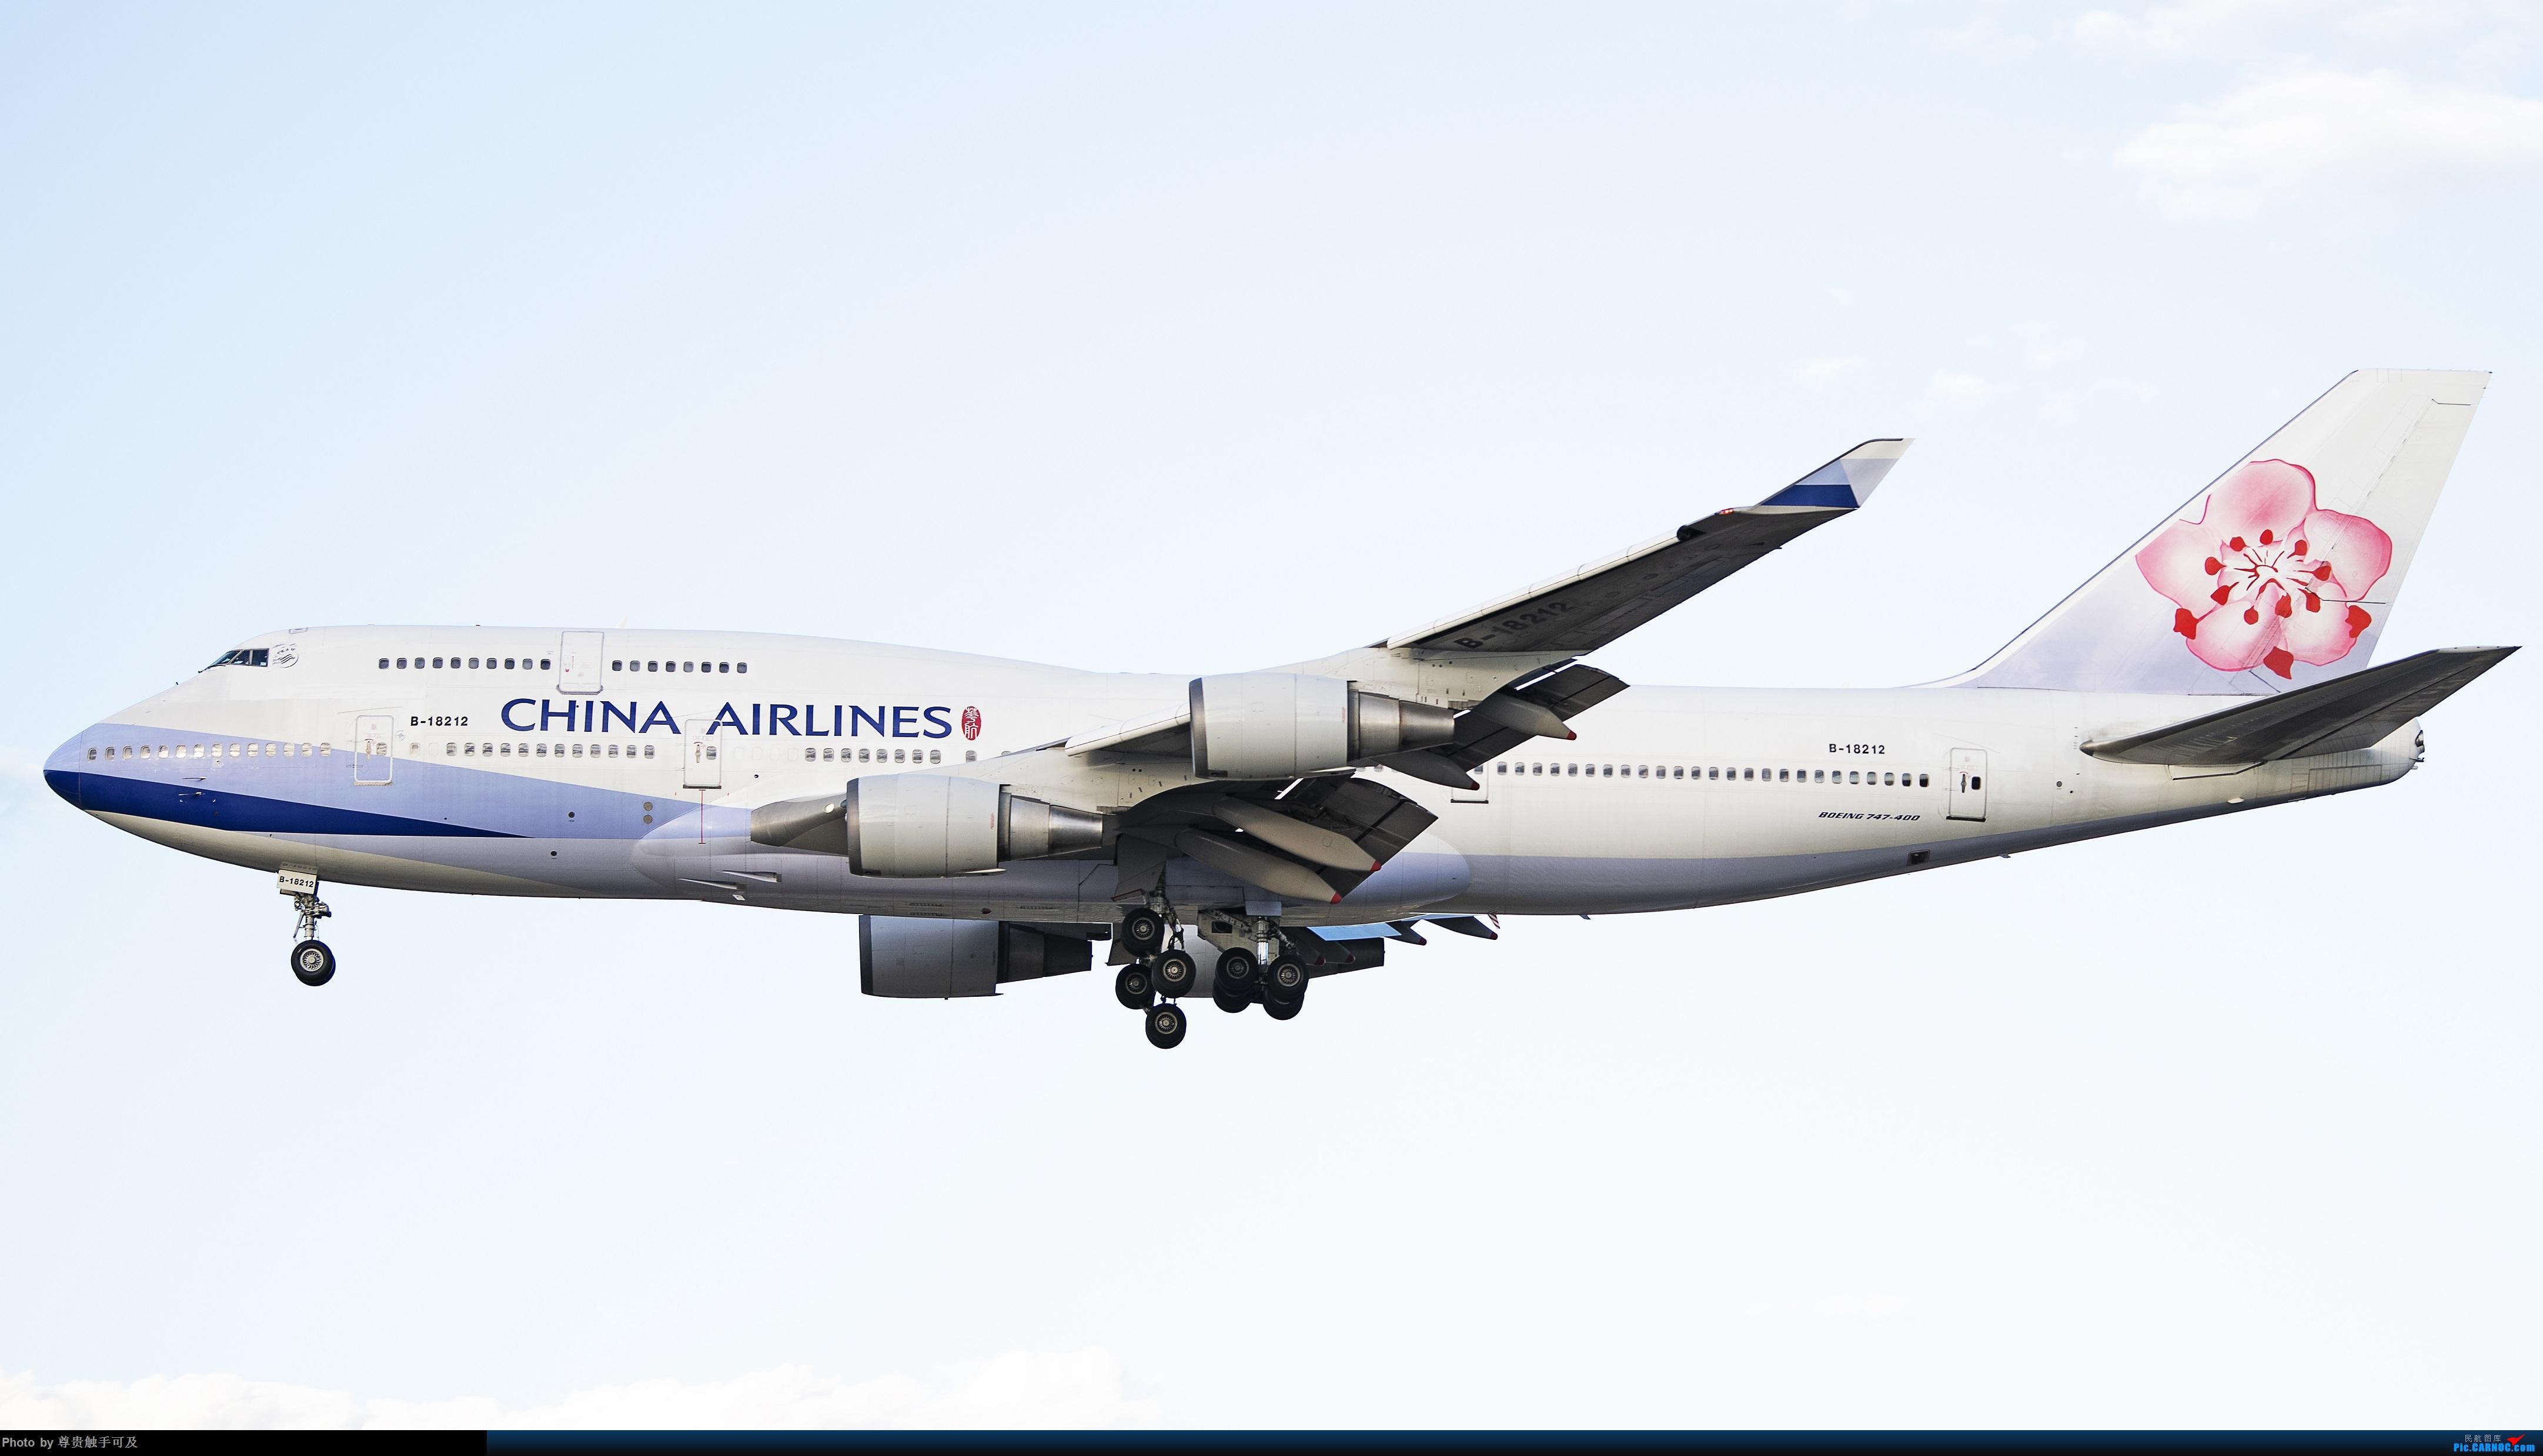 Re:继380后,再晒晒747,都是大家伙! 哈.... BOEING 747-400 B-18212 T3